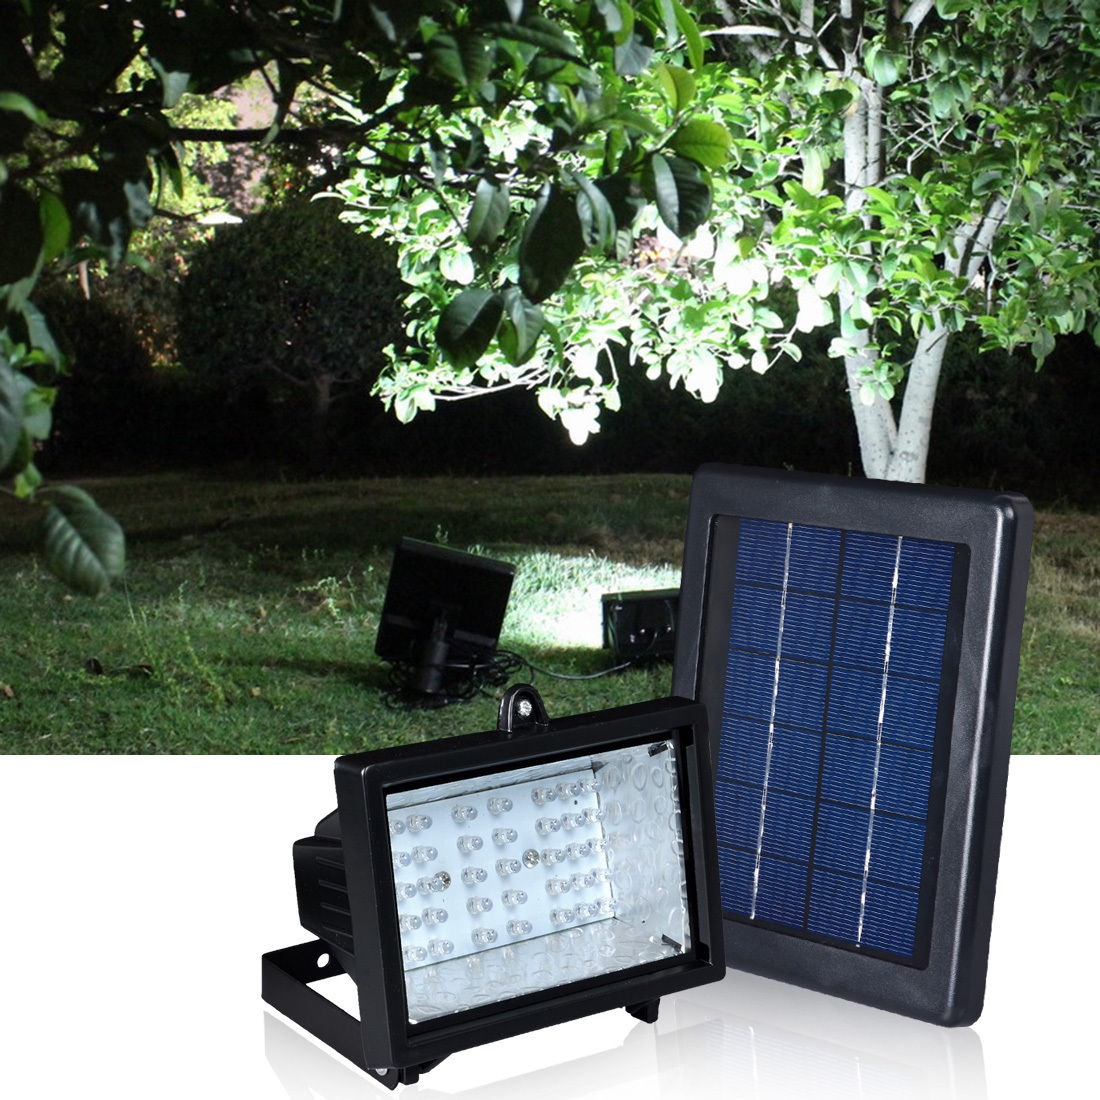 solar ultra bright 30 led outdoor garden spot flood light waterproof. Black Bedroom Furniture Sets. Home Design Ideas